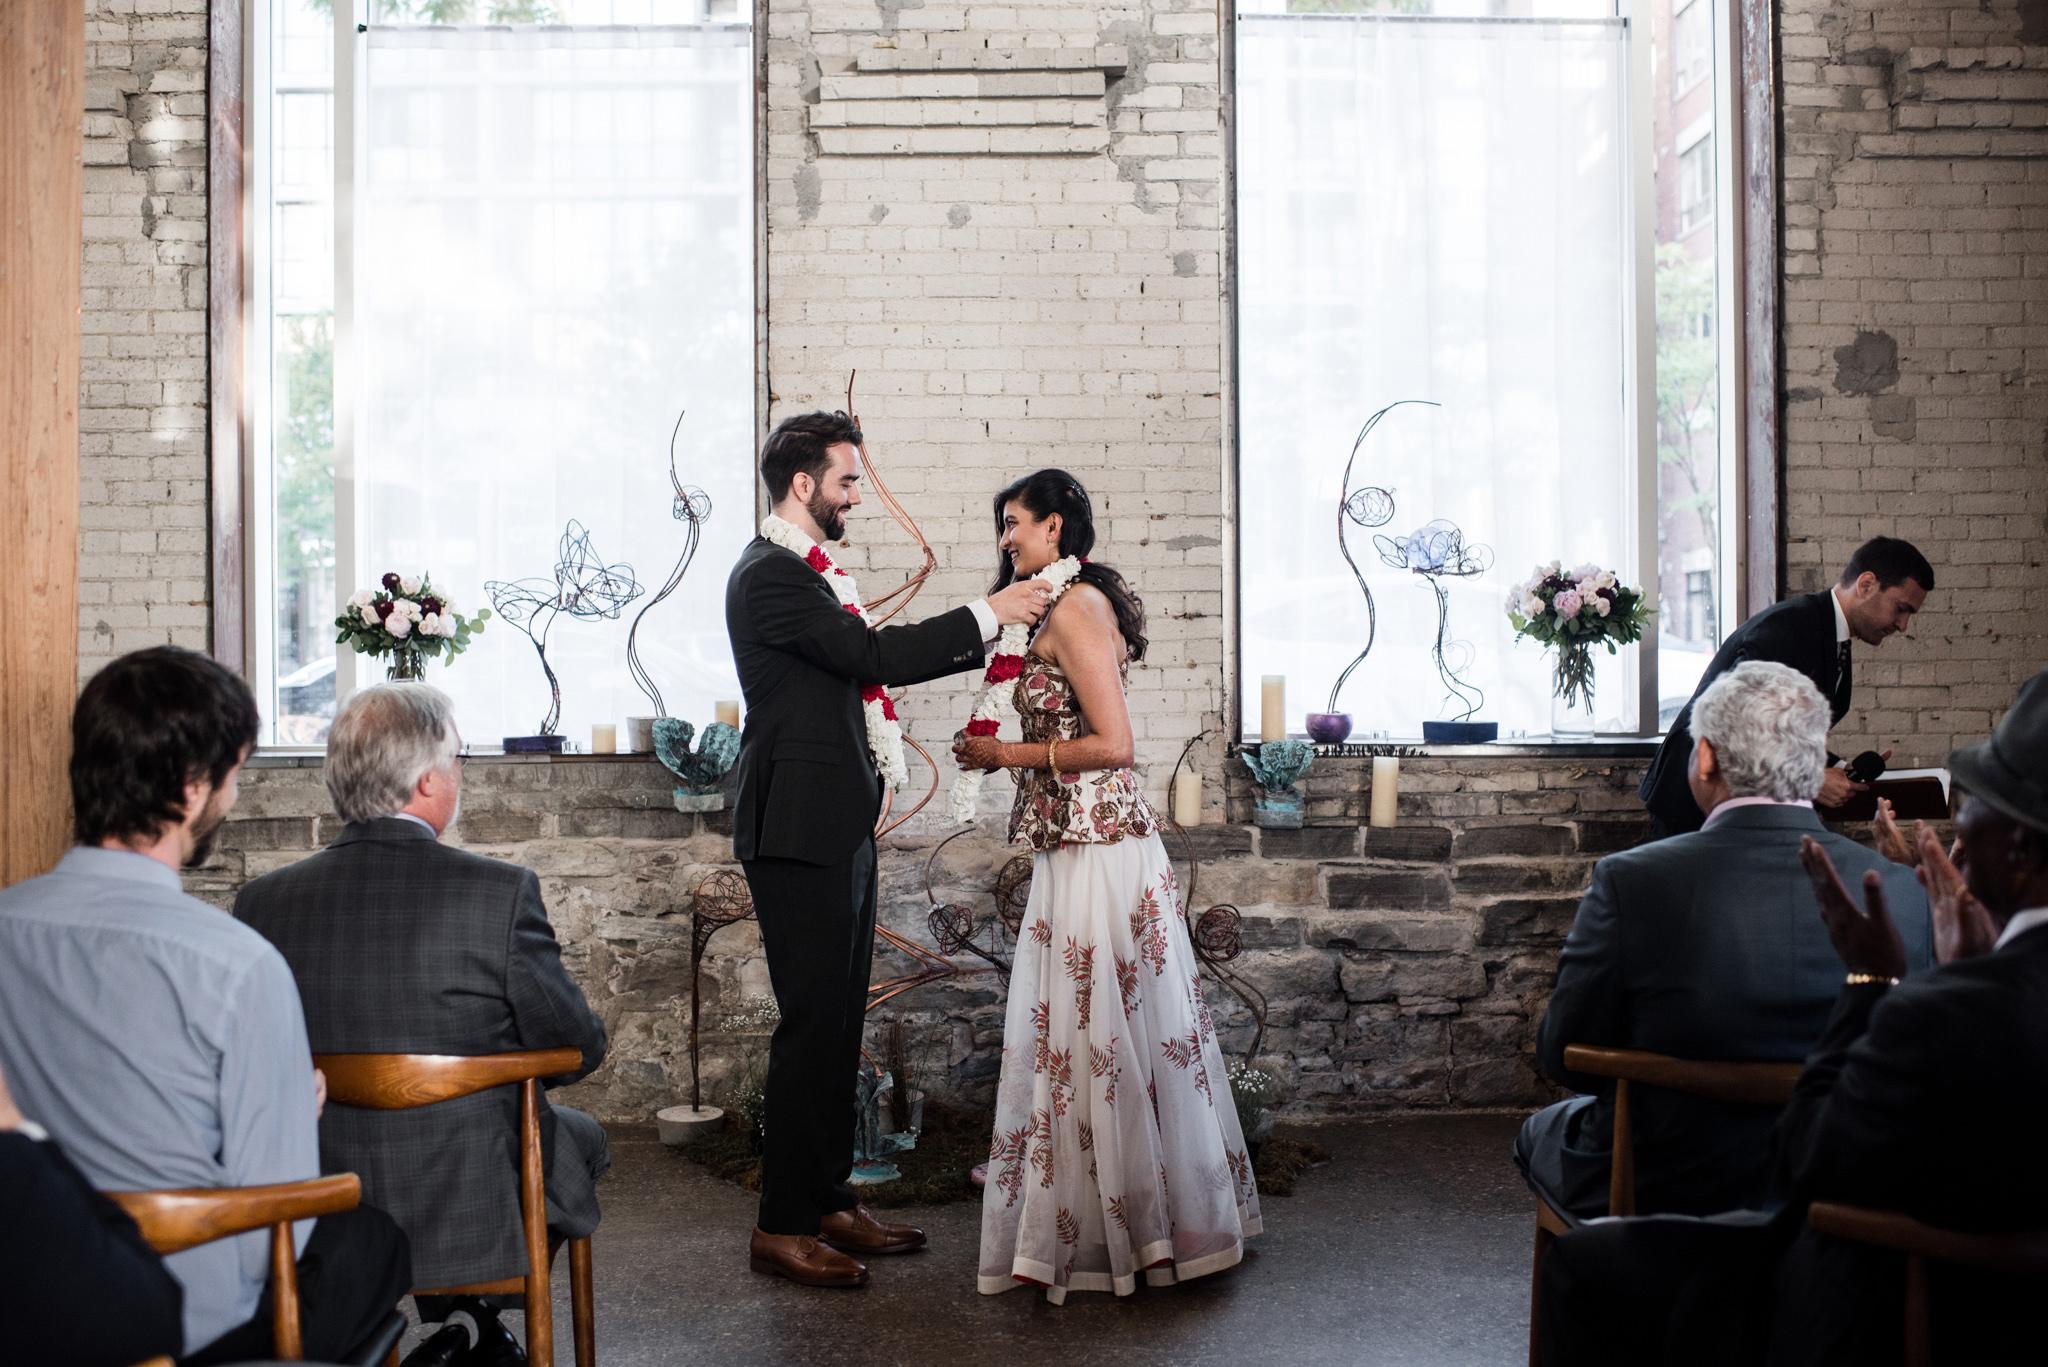 073-ring-wedding-bride-groom-ceremony-toronto-downtown-photos.jpg